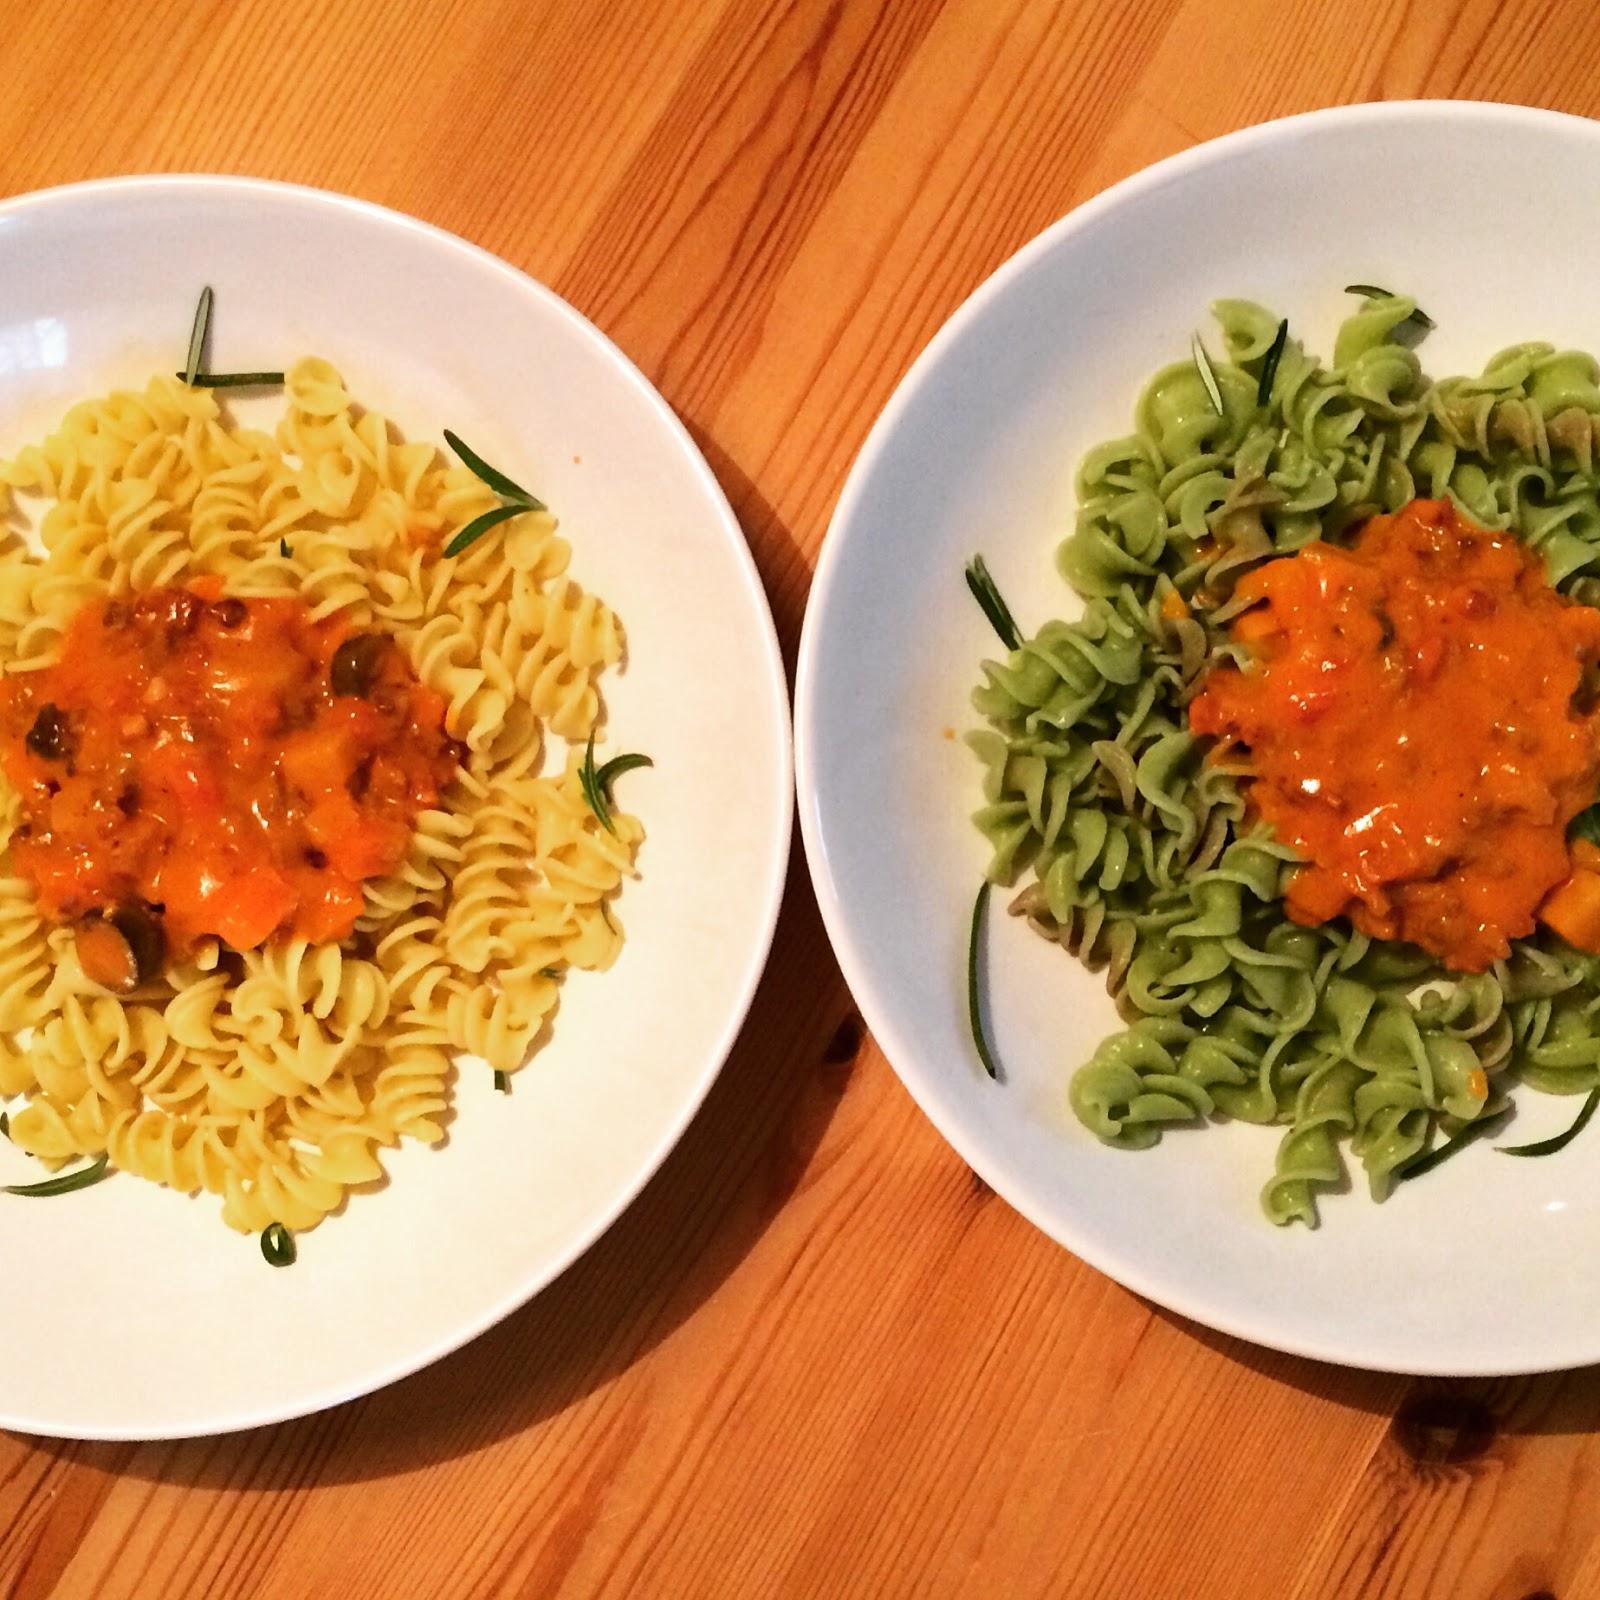 glutenfreier zauber noglla pasta sauce. Black Bedroom Furniture Sets. Home Design Ideas